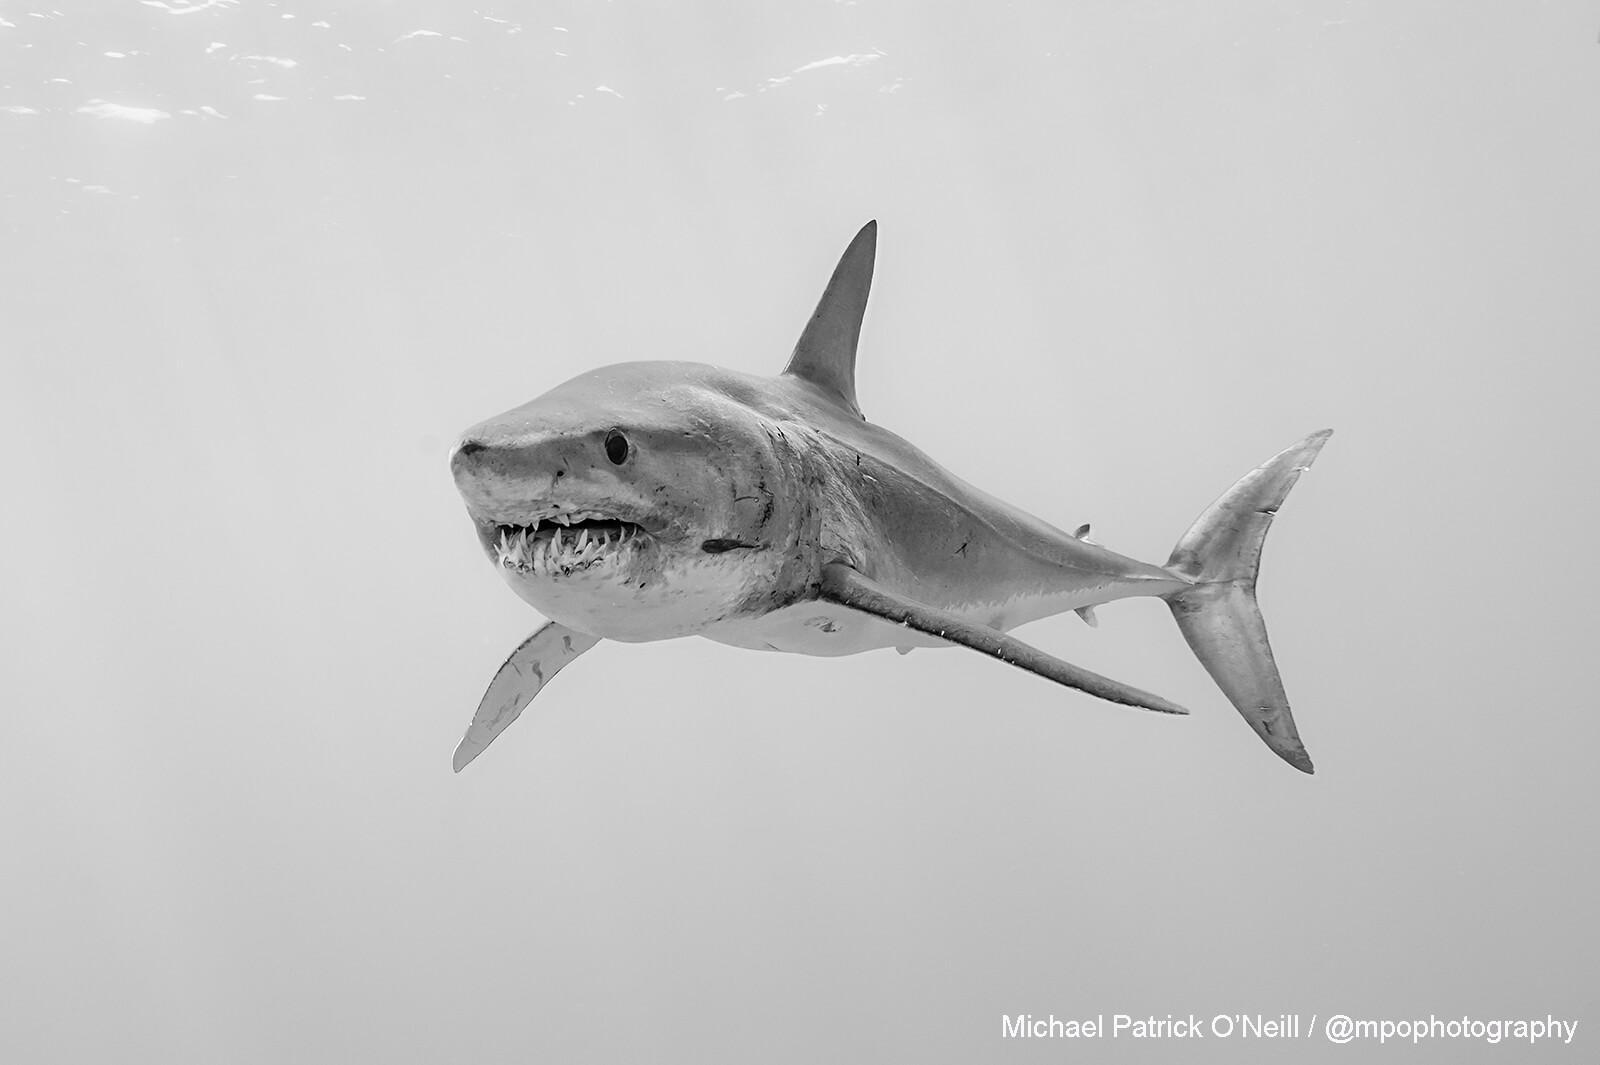 Short fin Mako Shark, Azores. Underwater photography by Michael Patrick O'Neill